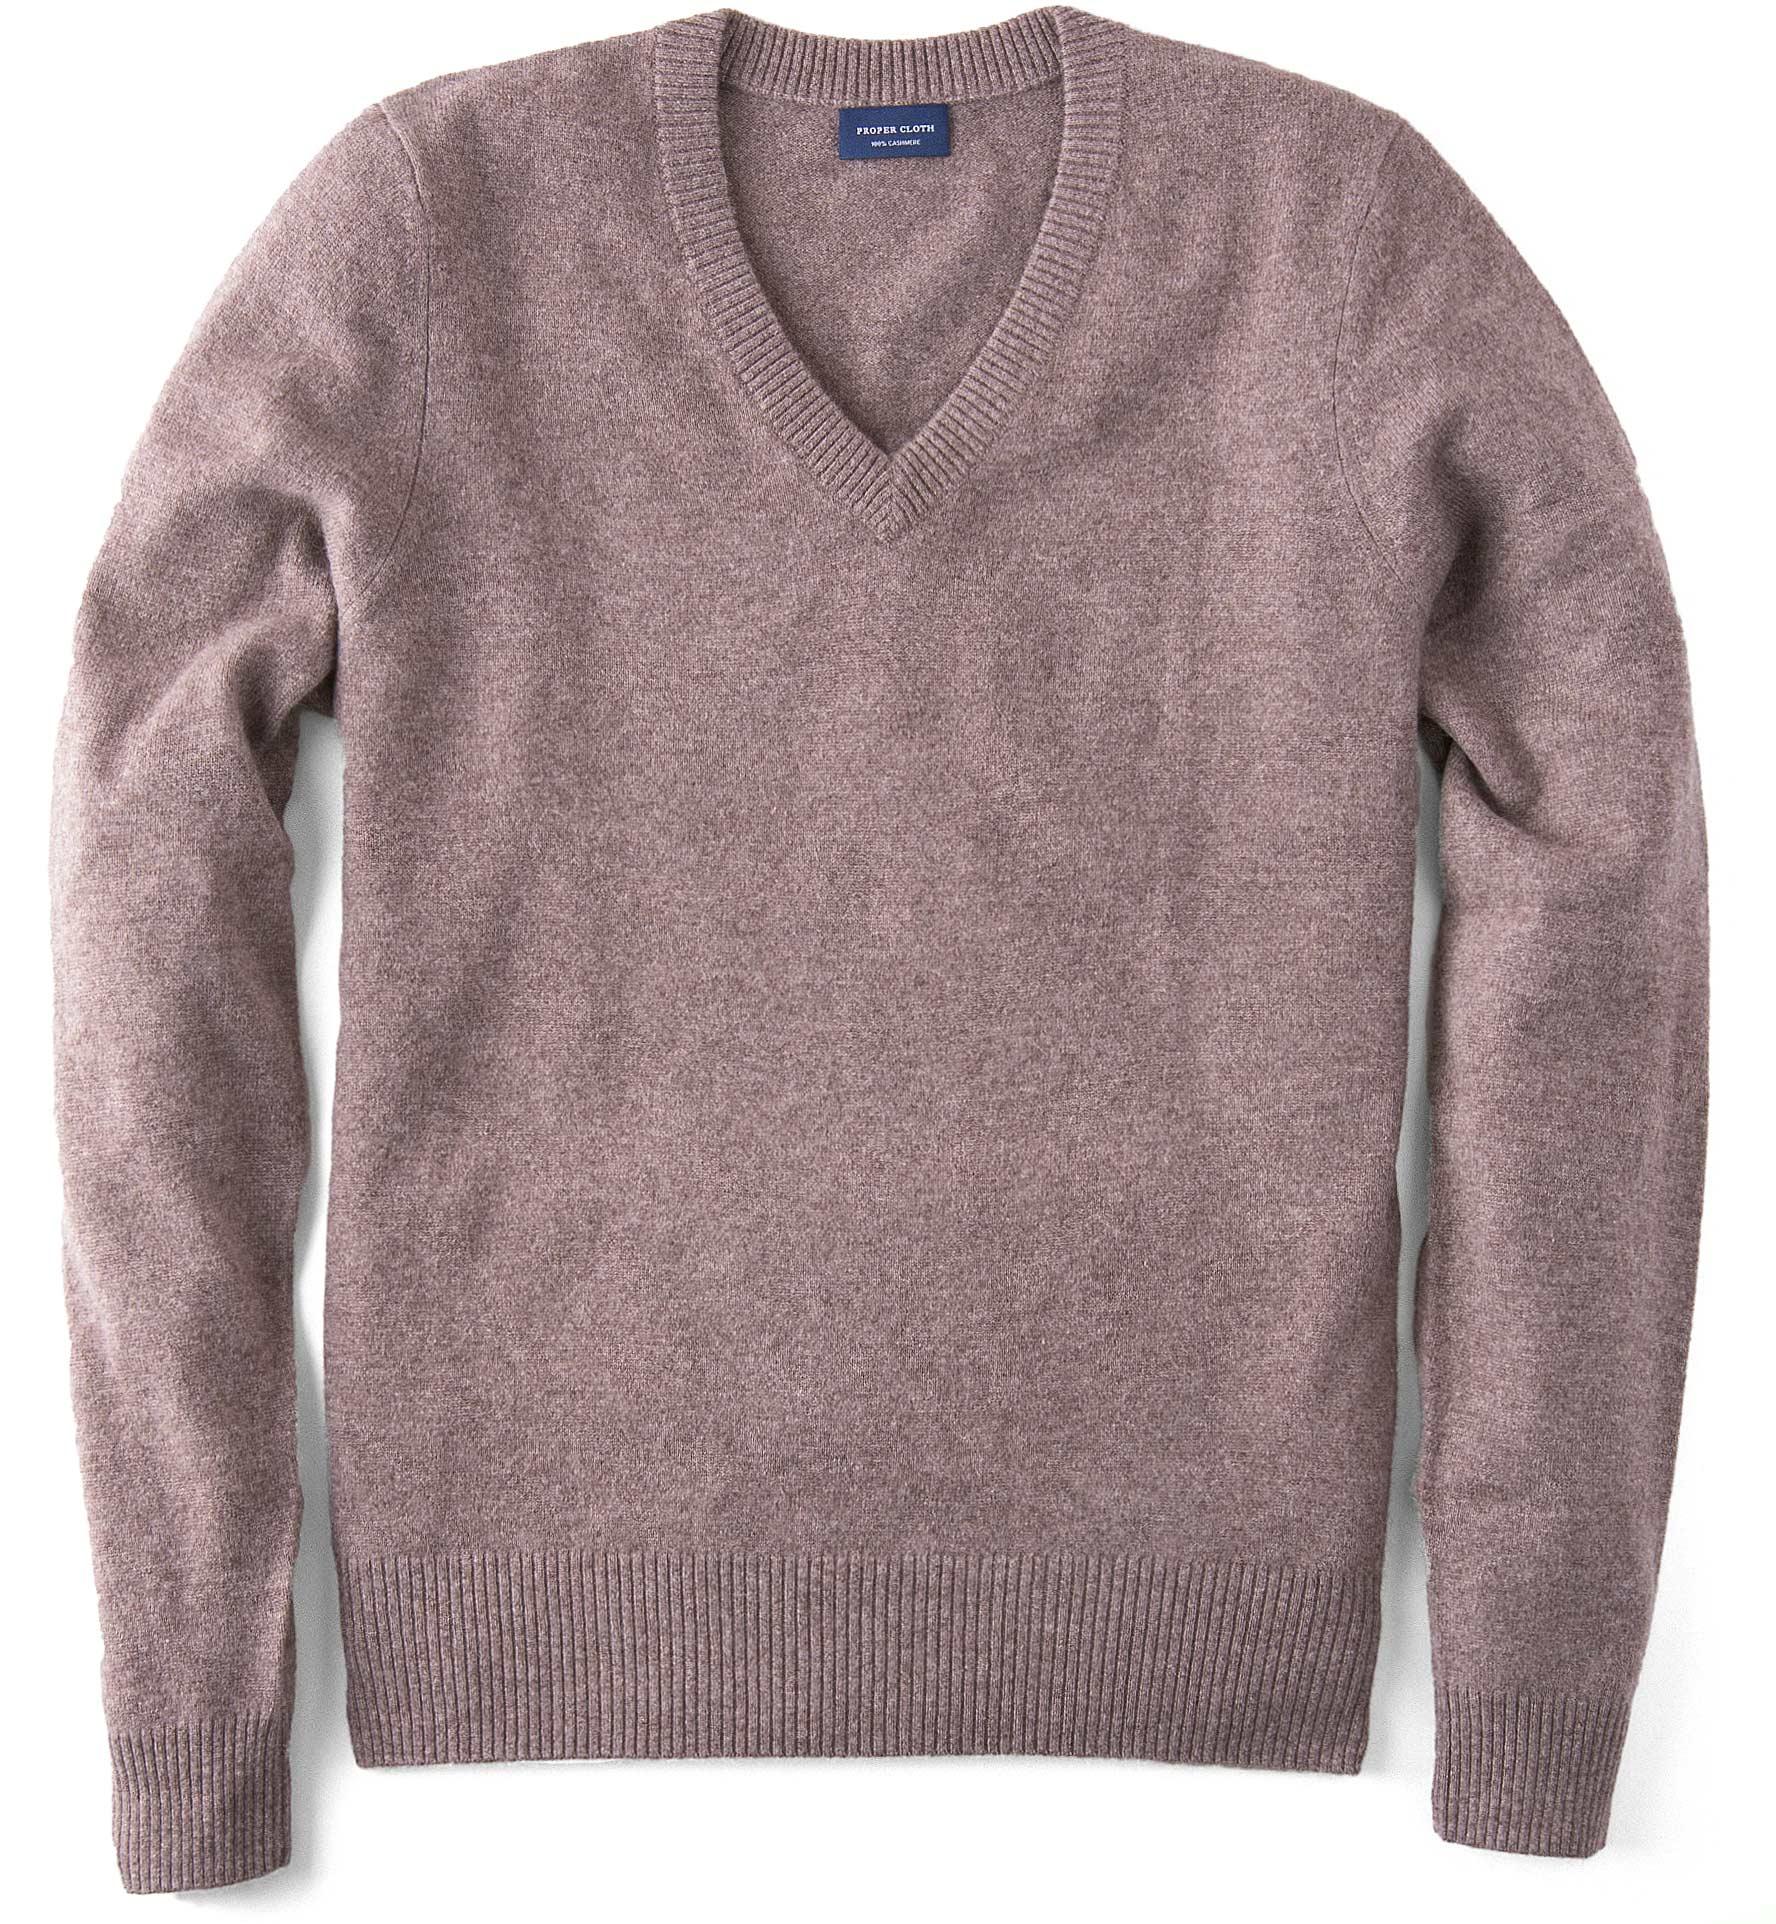 Zoom Image of Beige Cashmere V-Neck Sweater